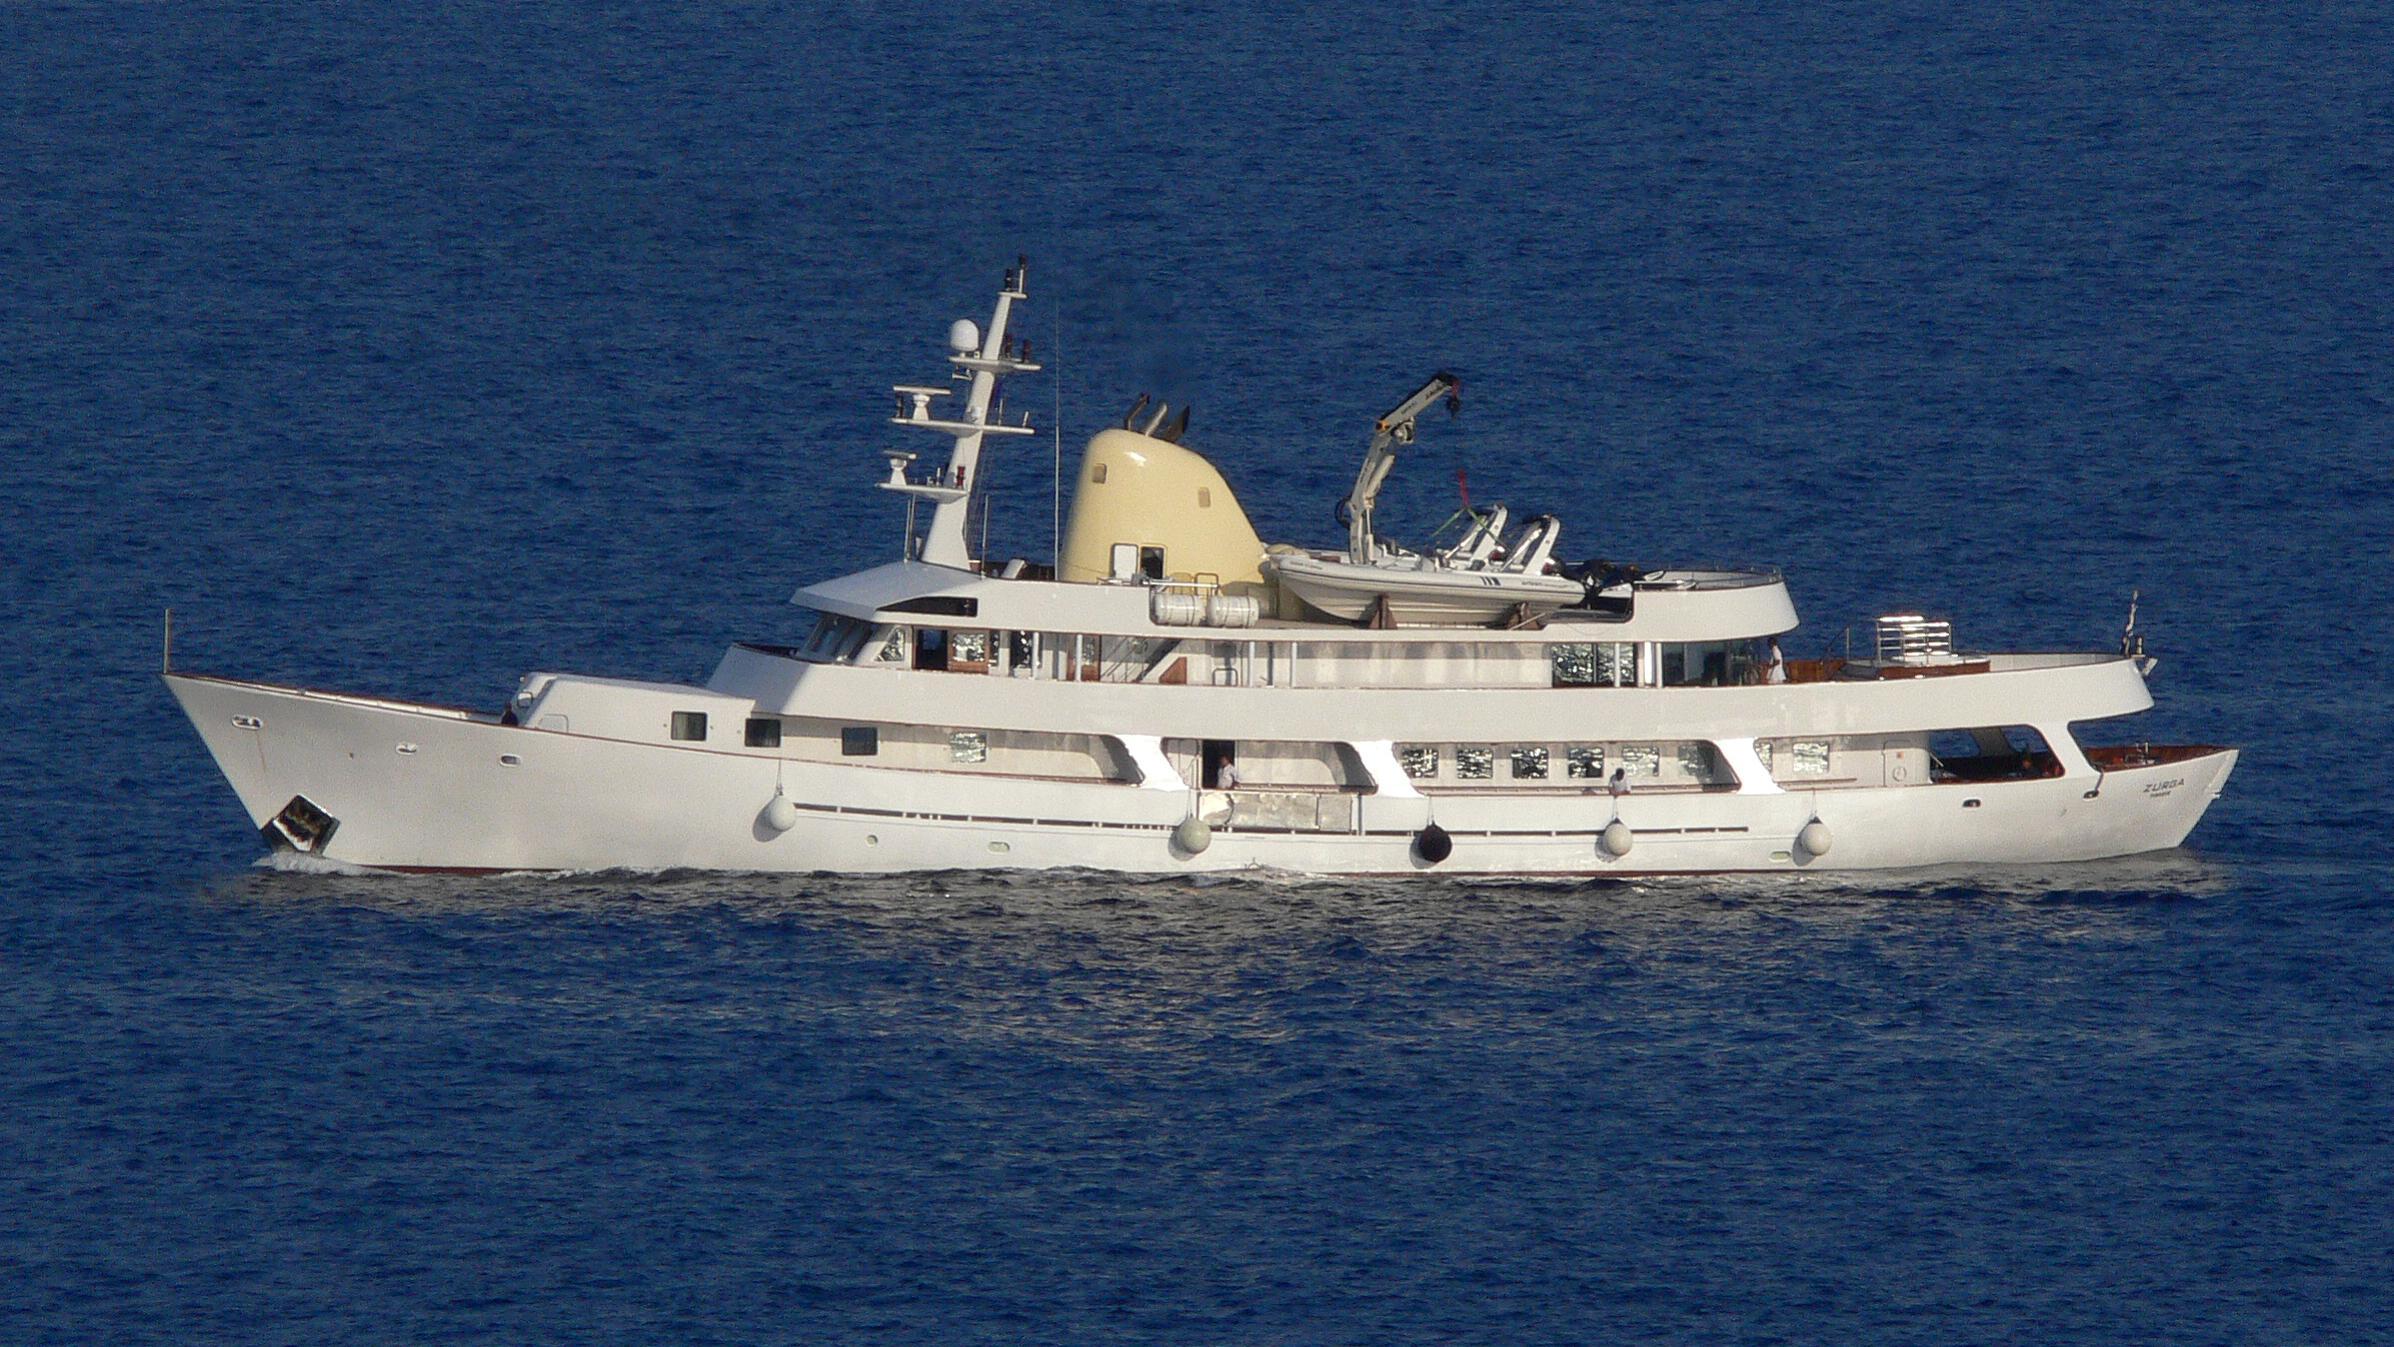 menorca zurga christina motoryacht 49m 1961 profile